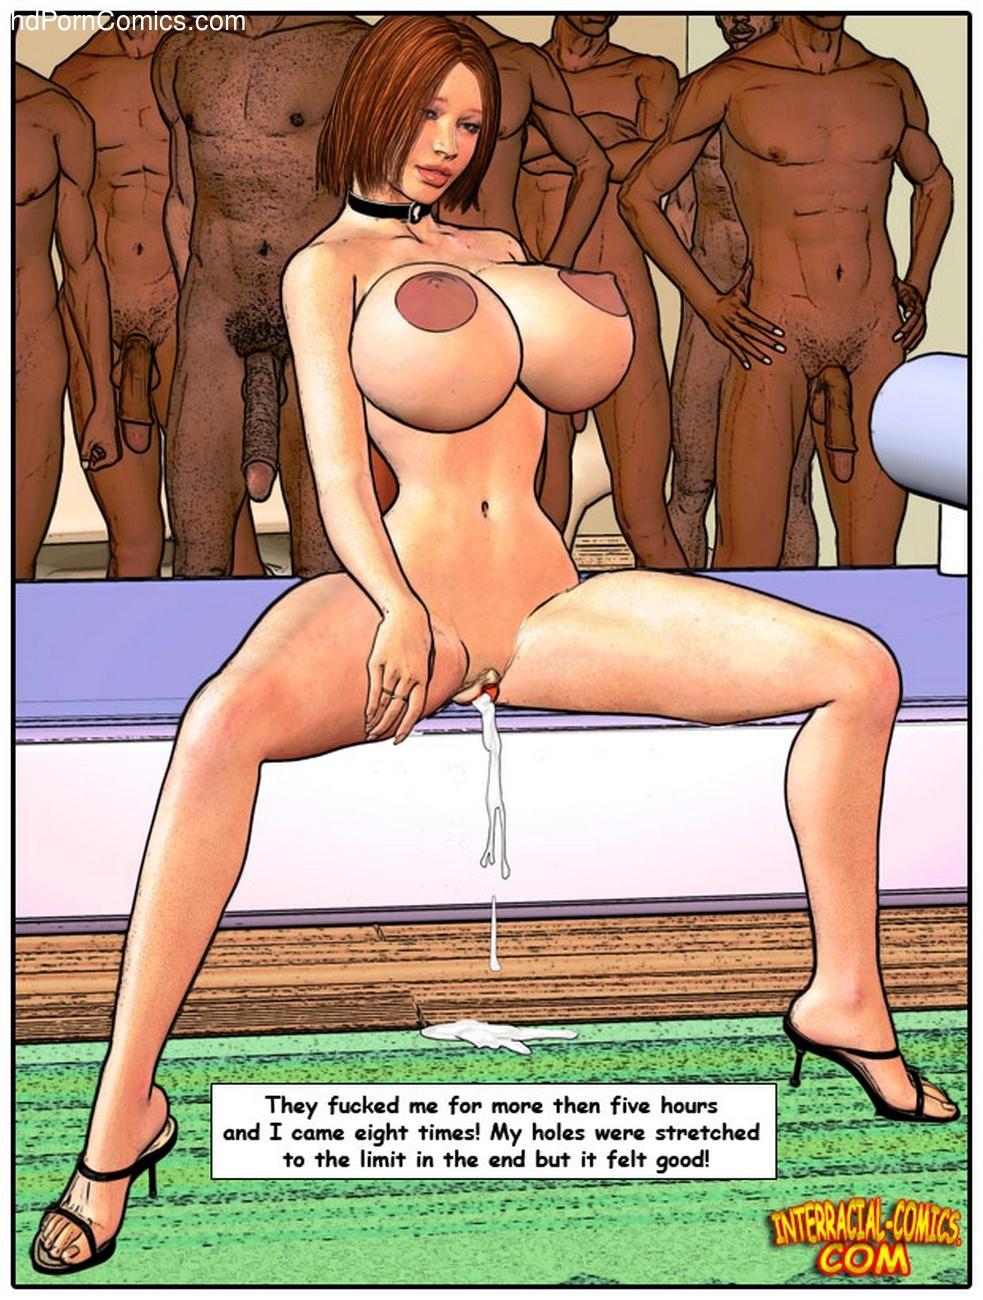 Teen dream porn comic remarkable